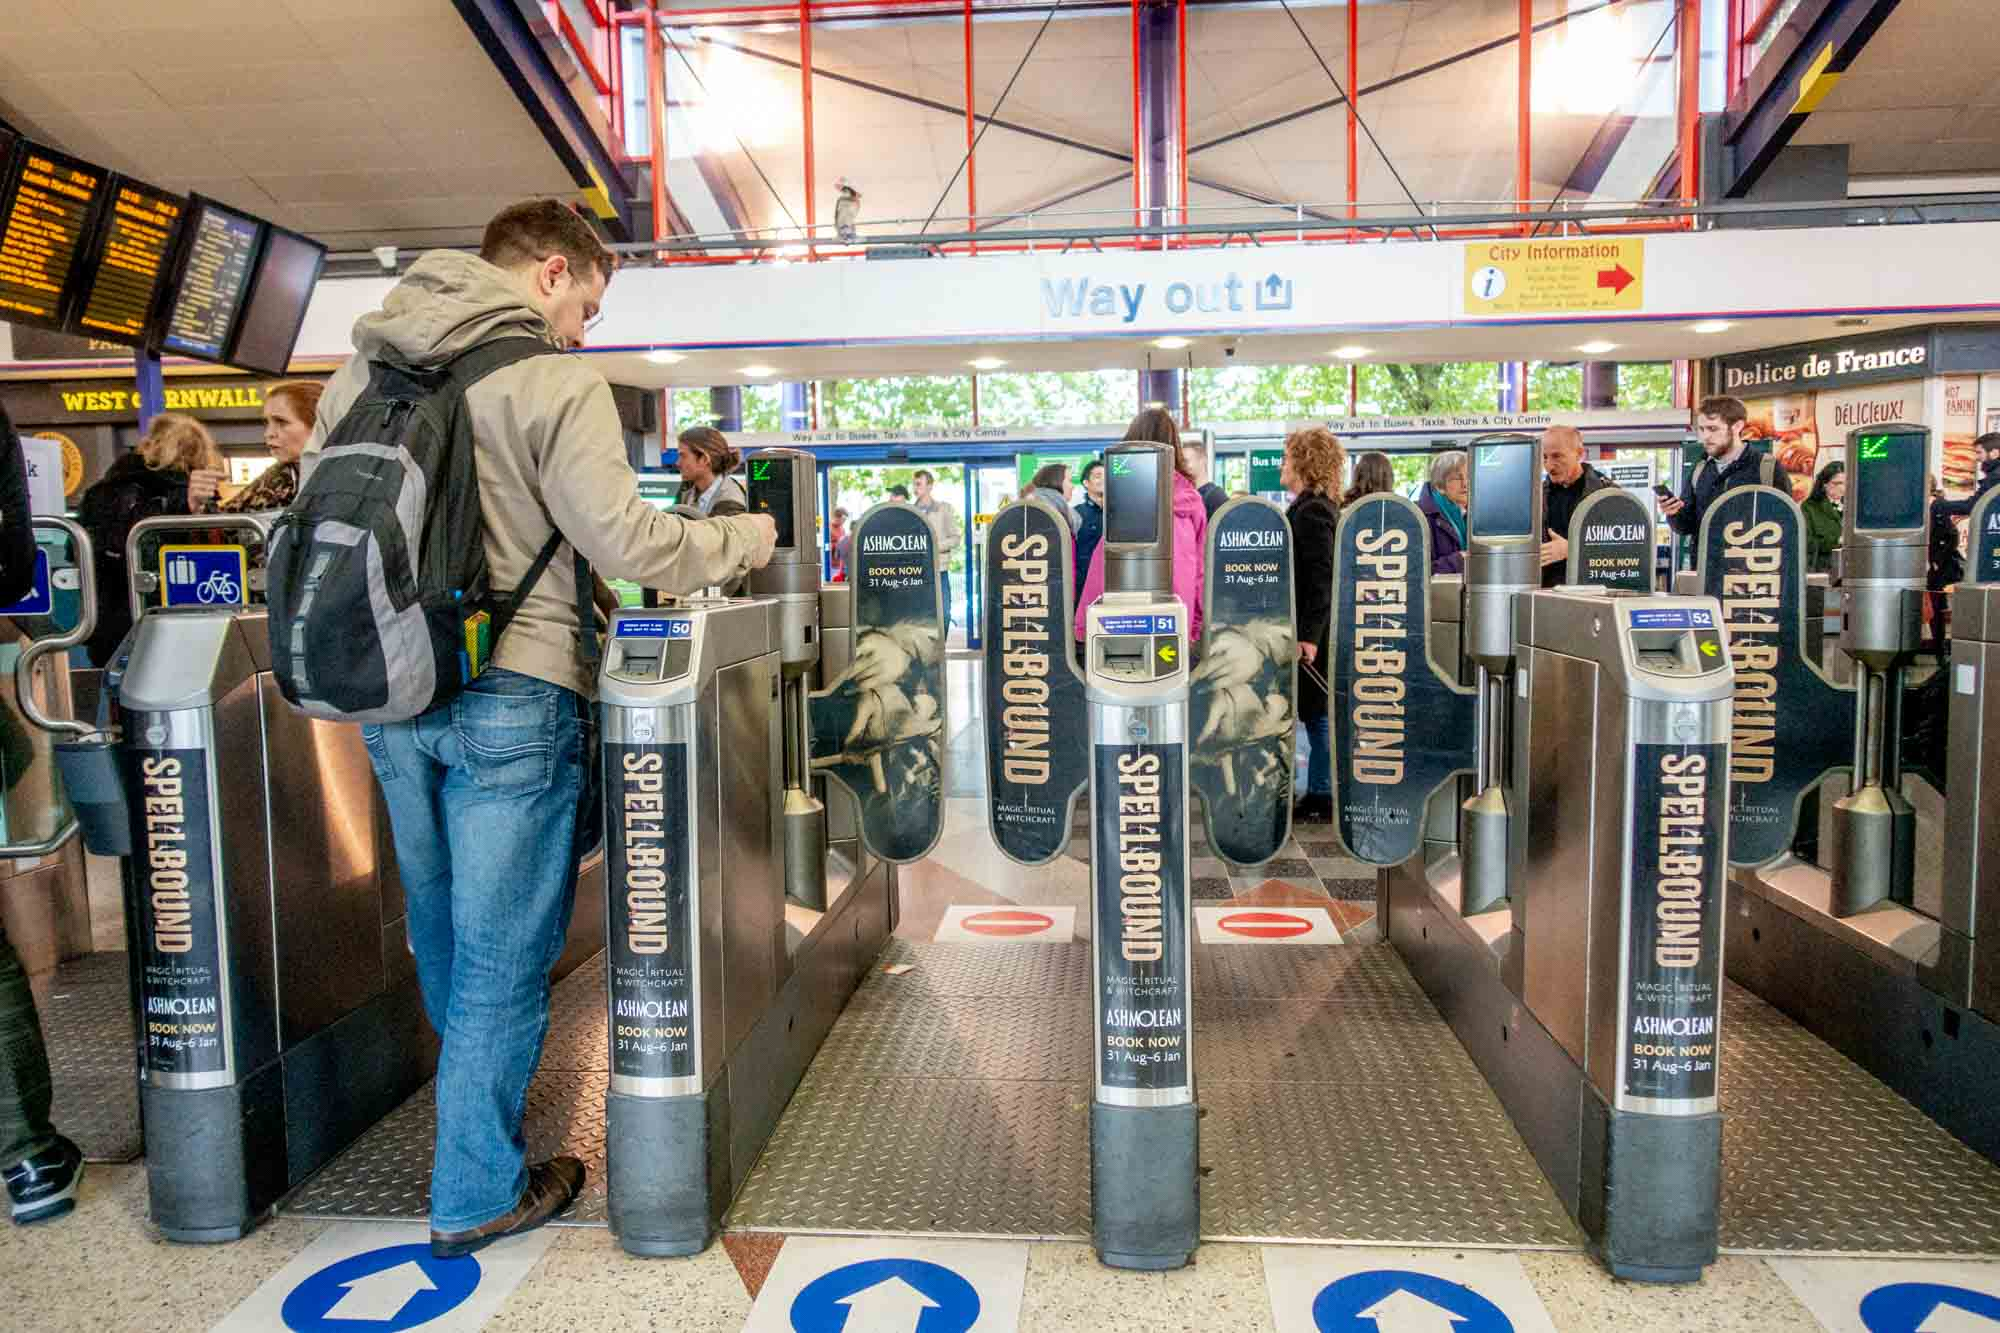 Man passing through turnstiles in a train station